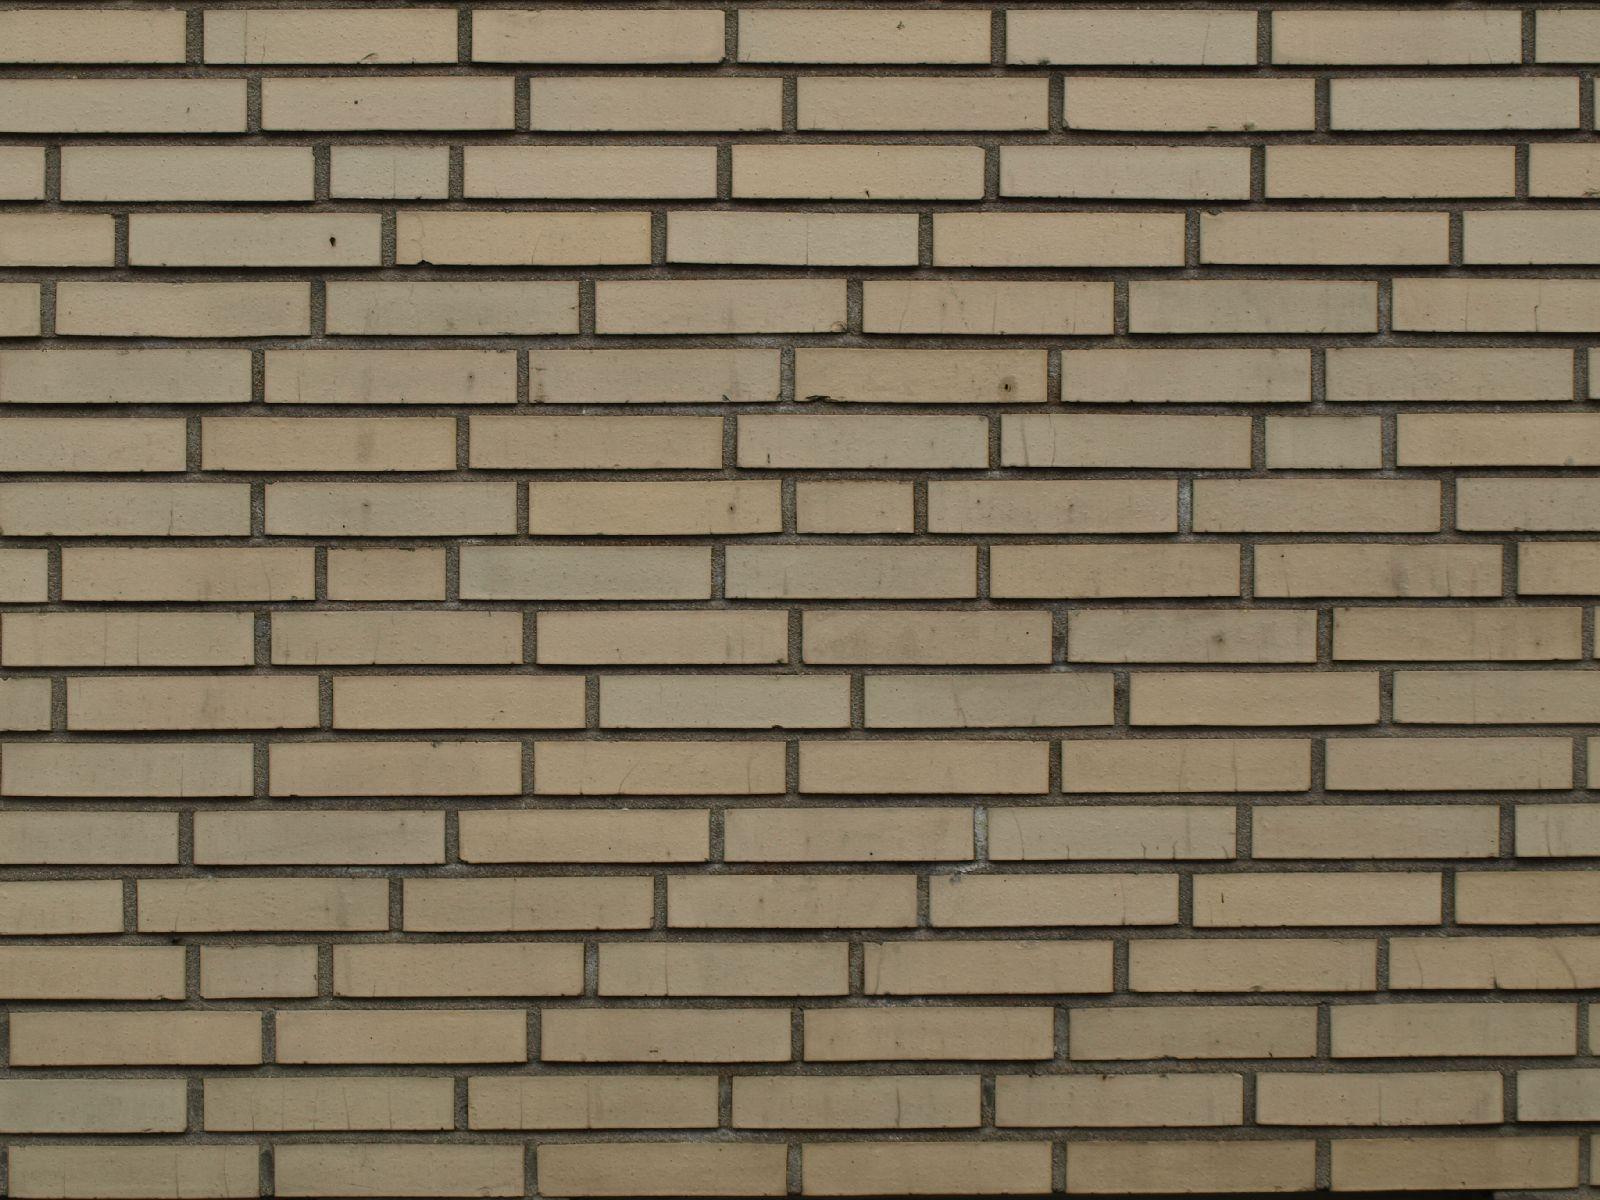 Wand-Mauerwerk-Backstein_Textur_A_P5313162